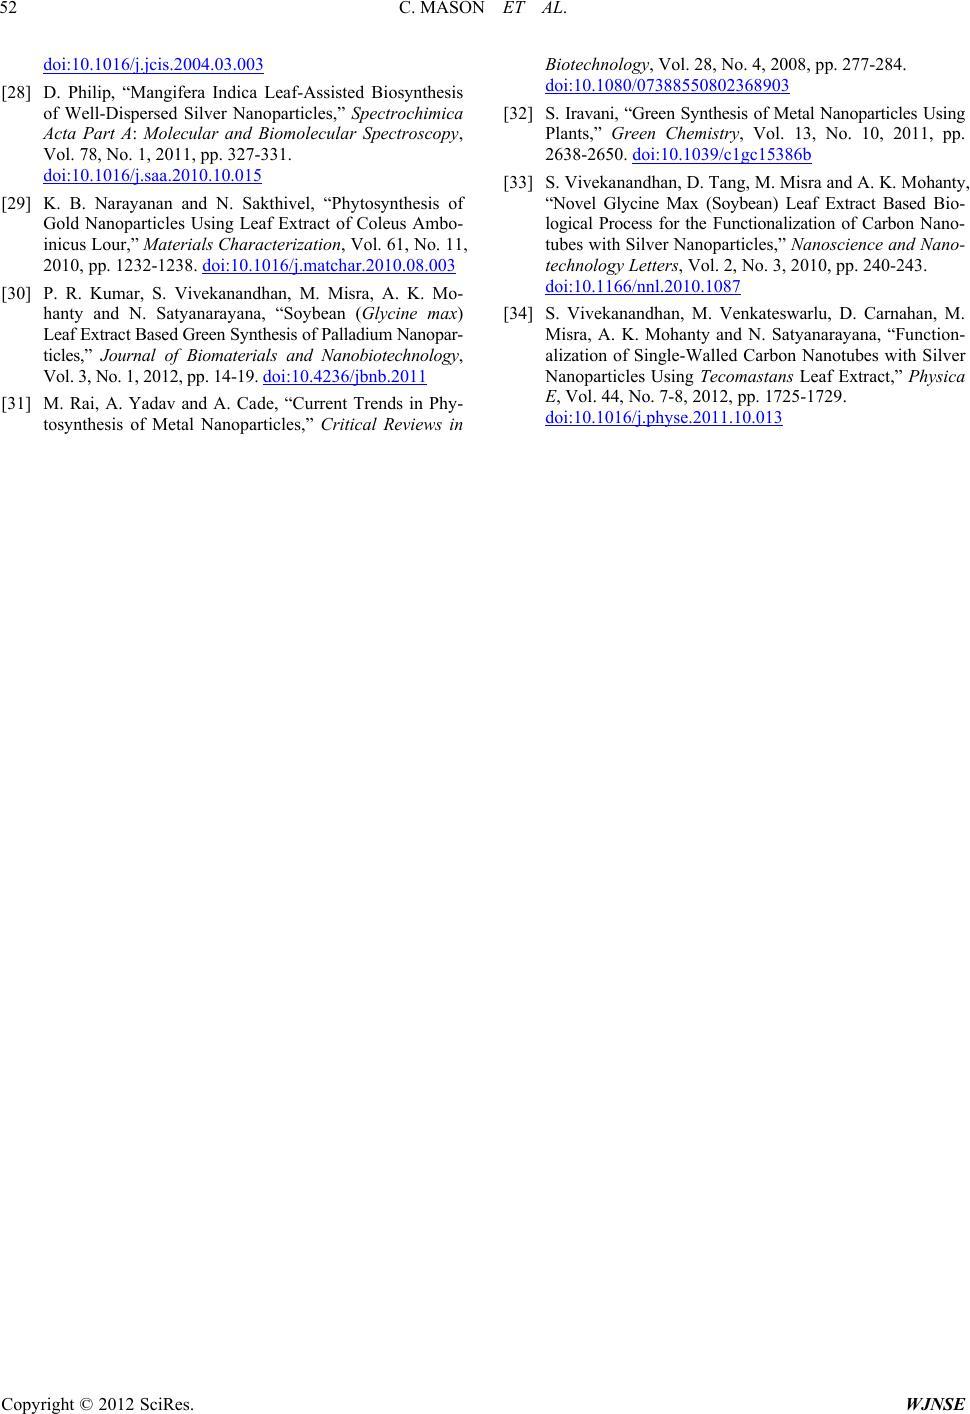 Satyanarayana Biochemistry TextBook PDF Free Download - Medicos Ideas